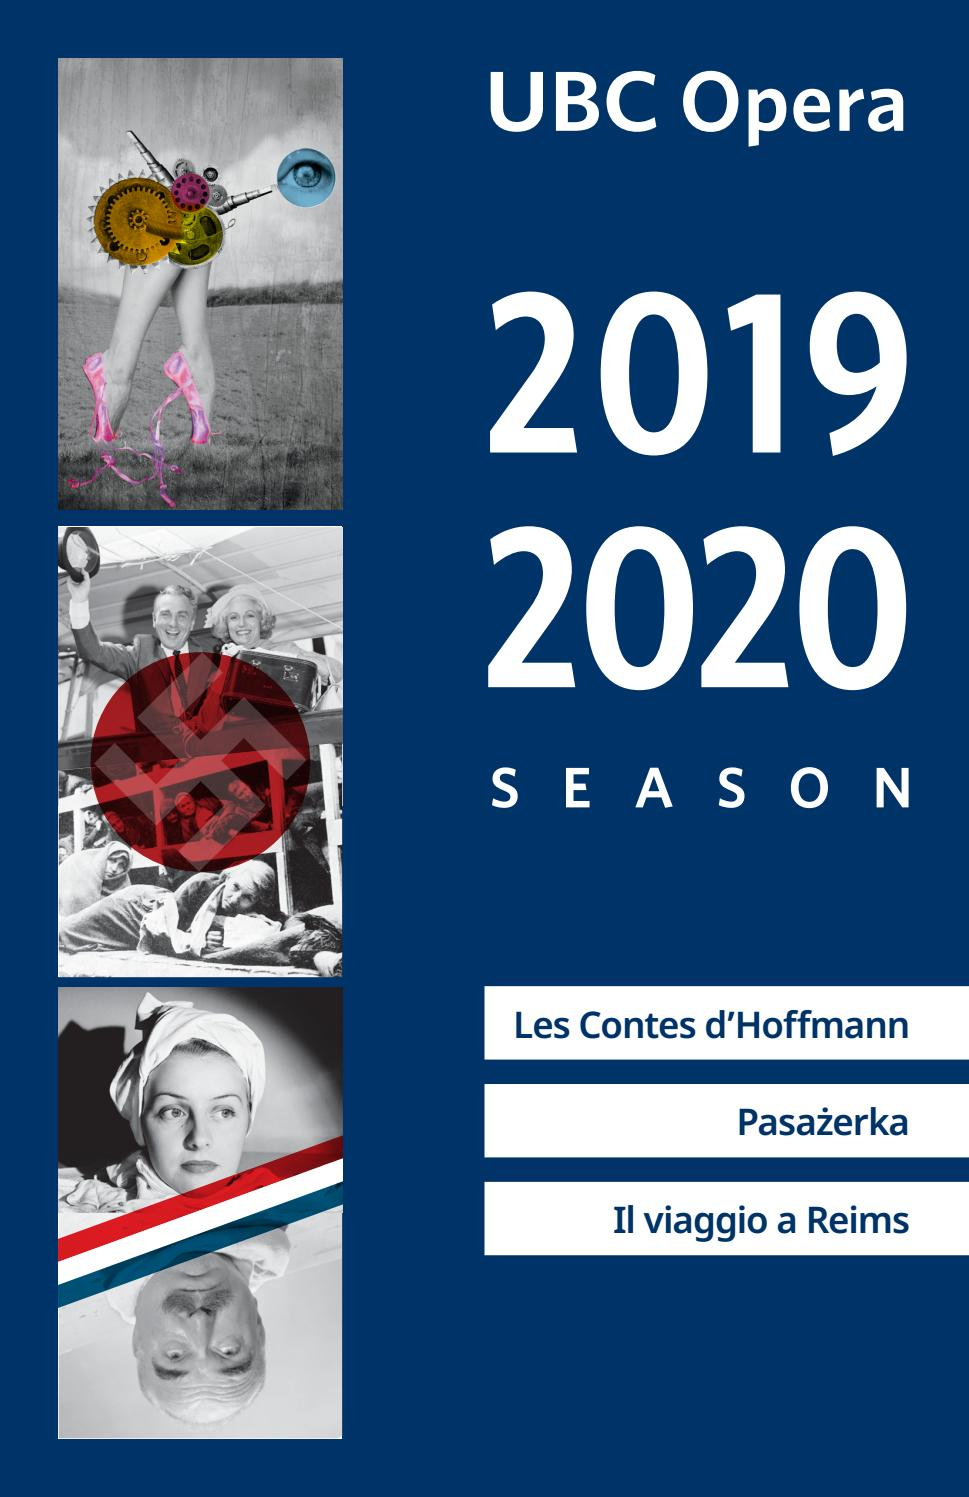 Opera In Park Saturday Night Barcarolle >> Ubc Opera 2019 2020 Season By Ubc Opera Ensemble Issuu